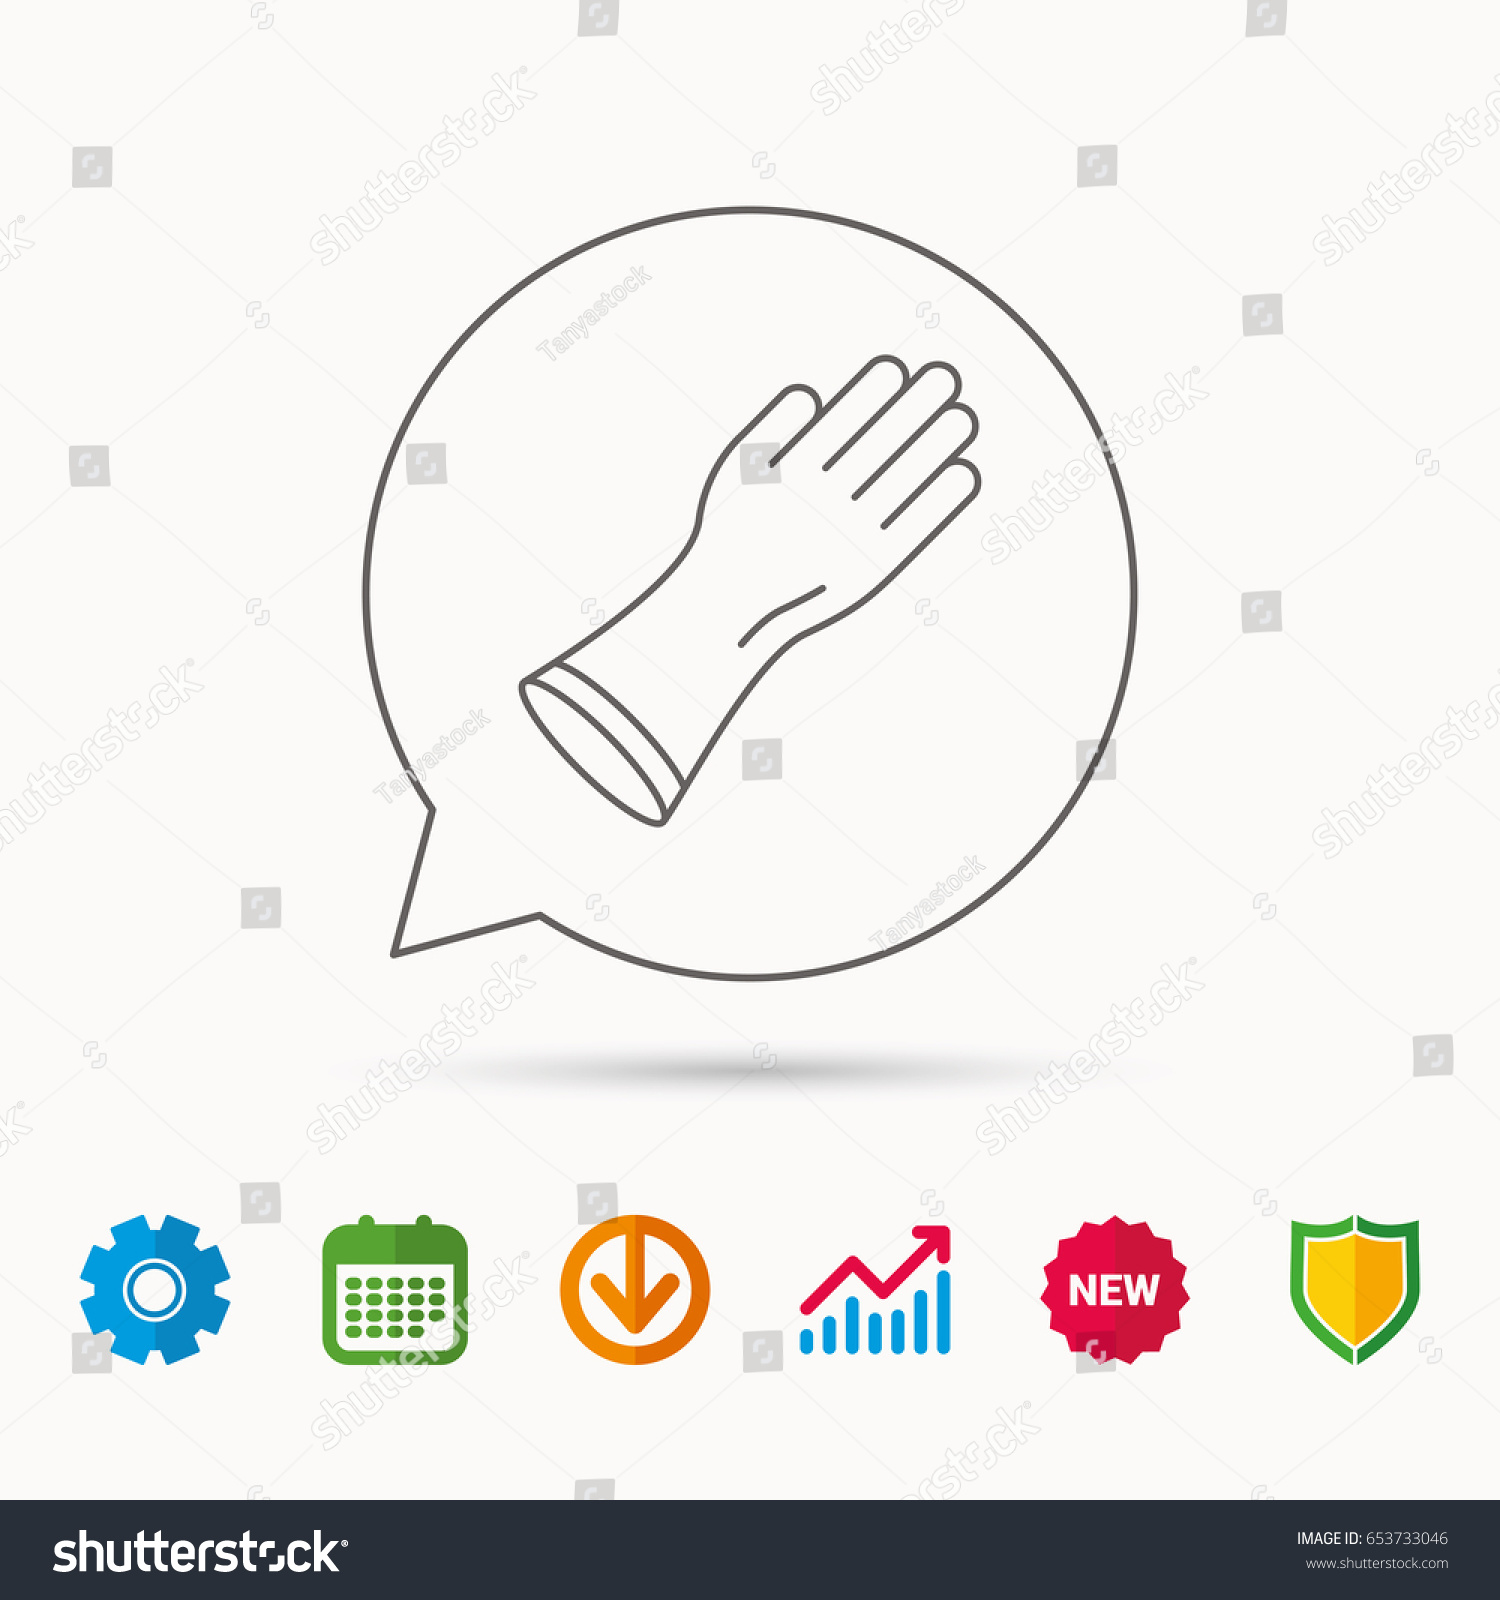 Rubber gloves icon latex hand protection stock vector 653733046 latex hand protection sign housework cleaning equipment symbol calendar biocorpaavc